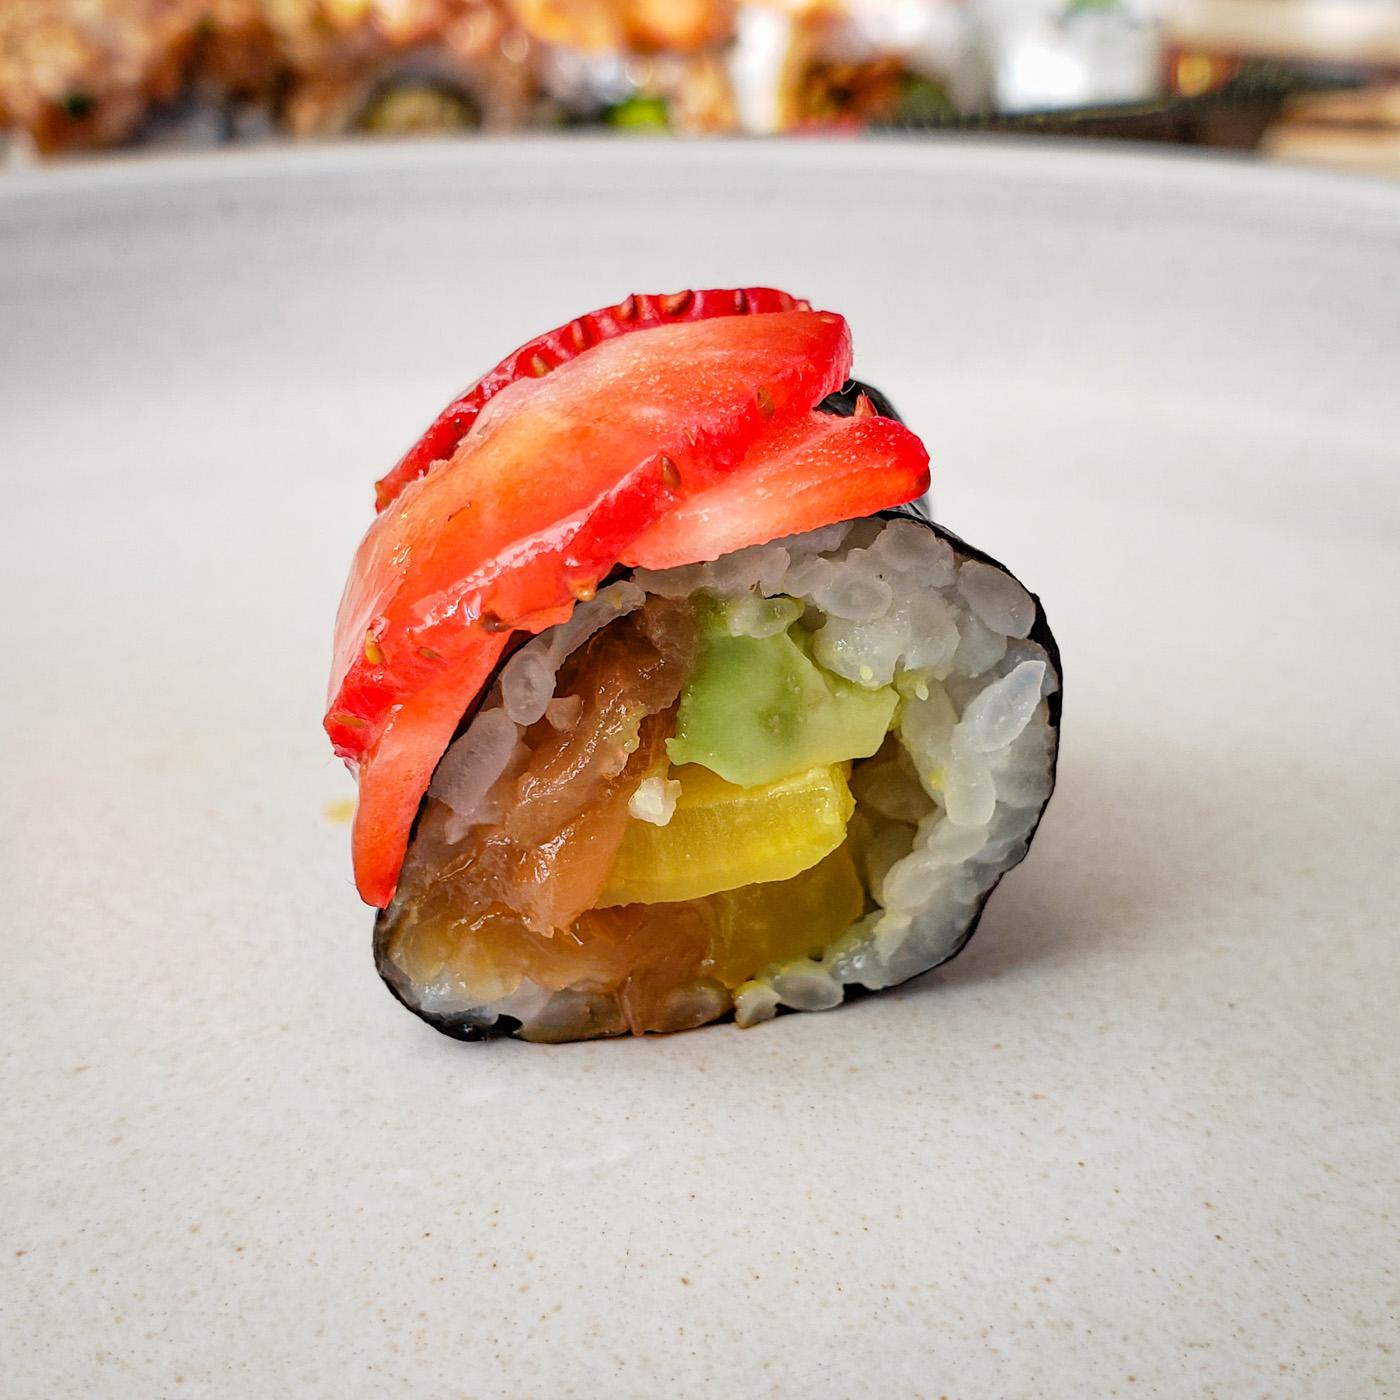 Straw-Veggie from Tomo Sushi and Ramen